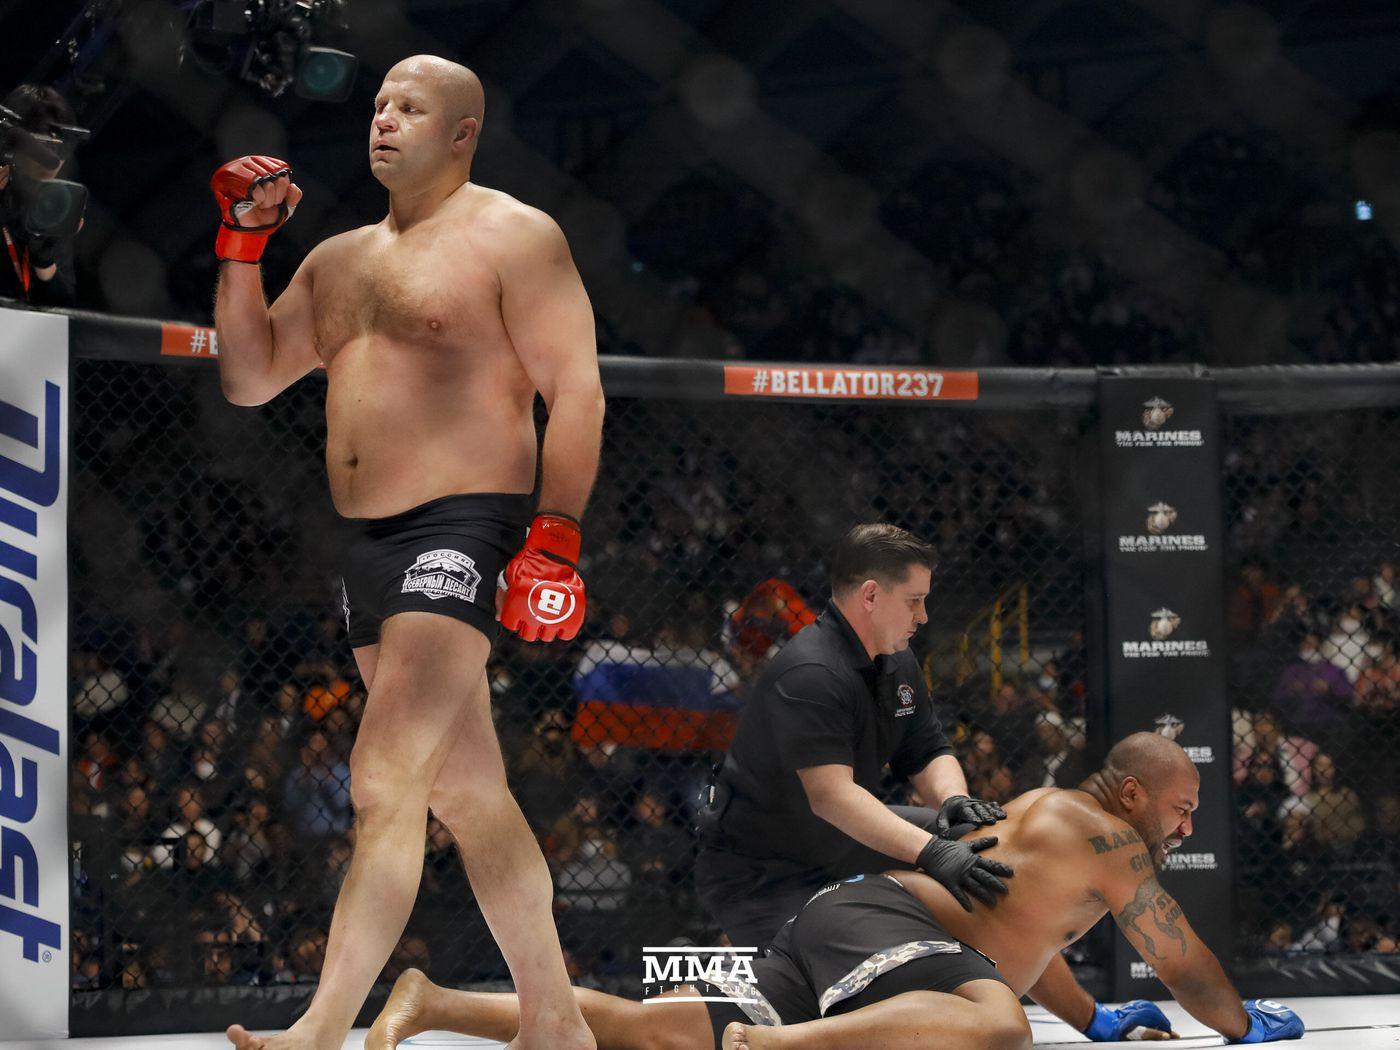 Fedor Emelianenko Knocks Out Rampage Jackson Announces Possible